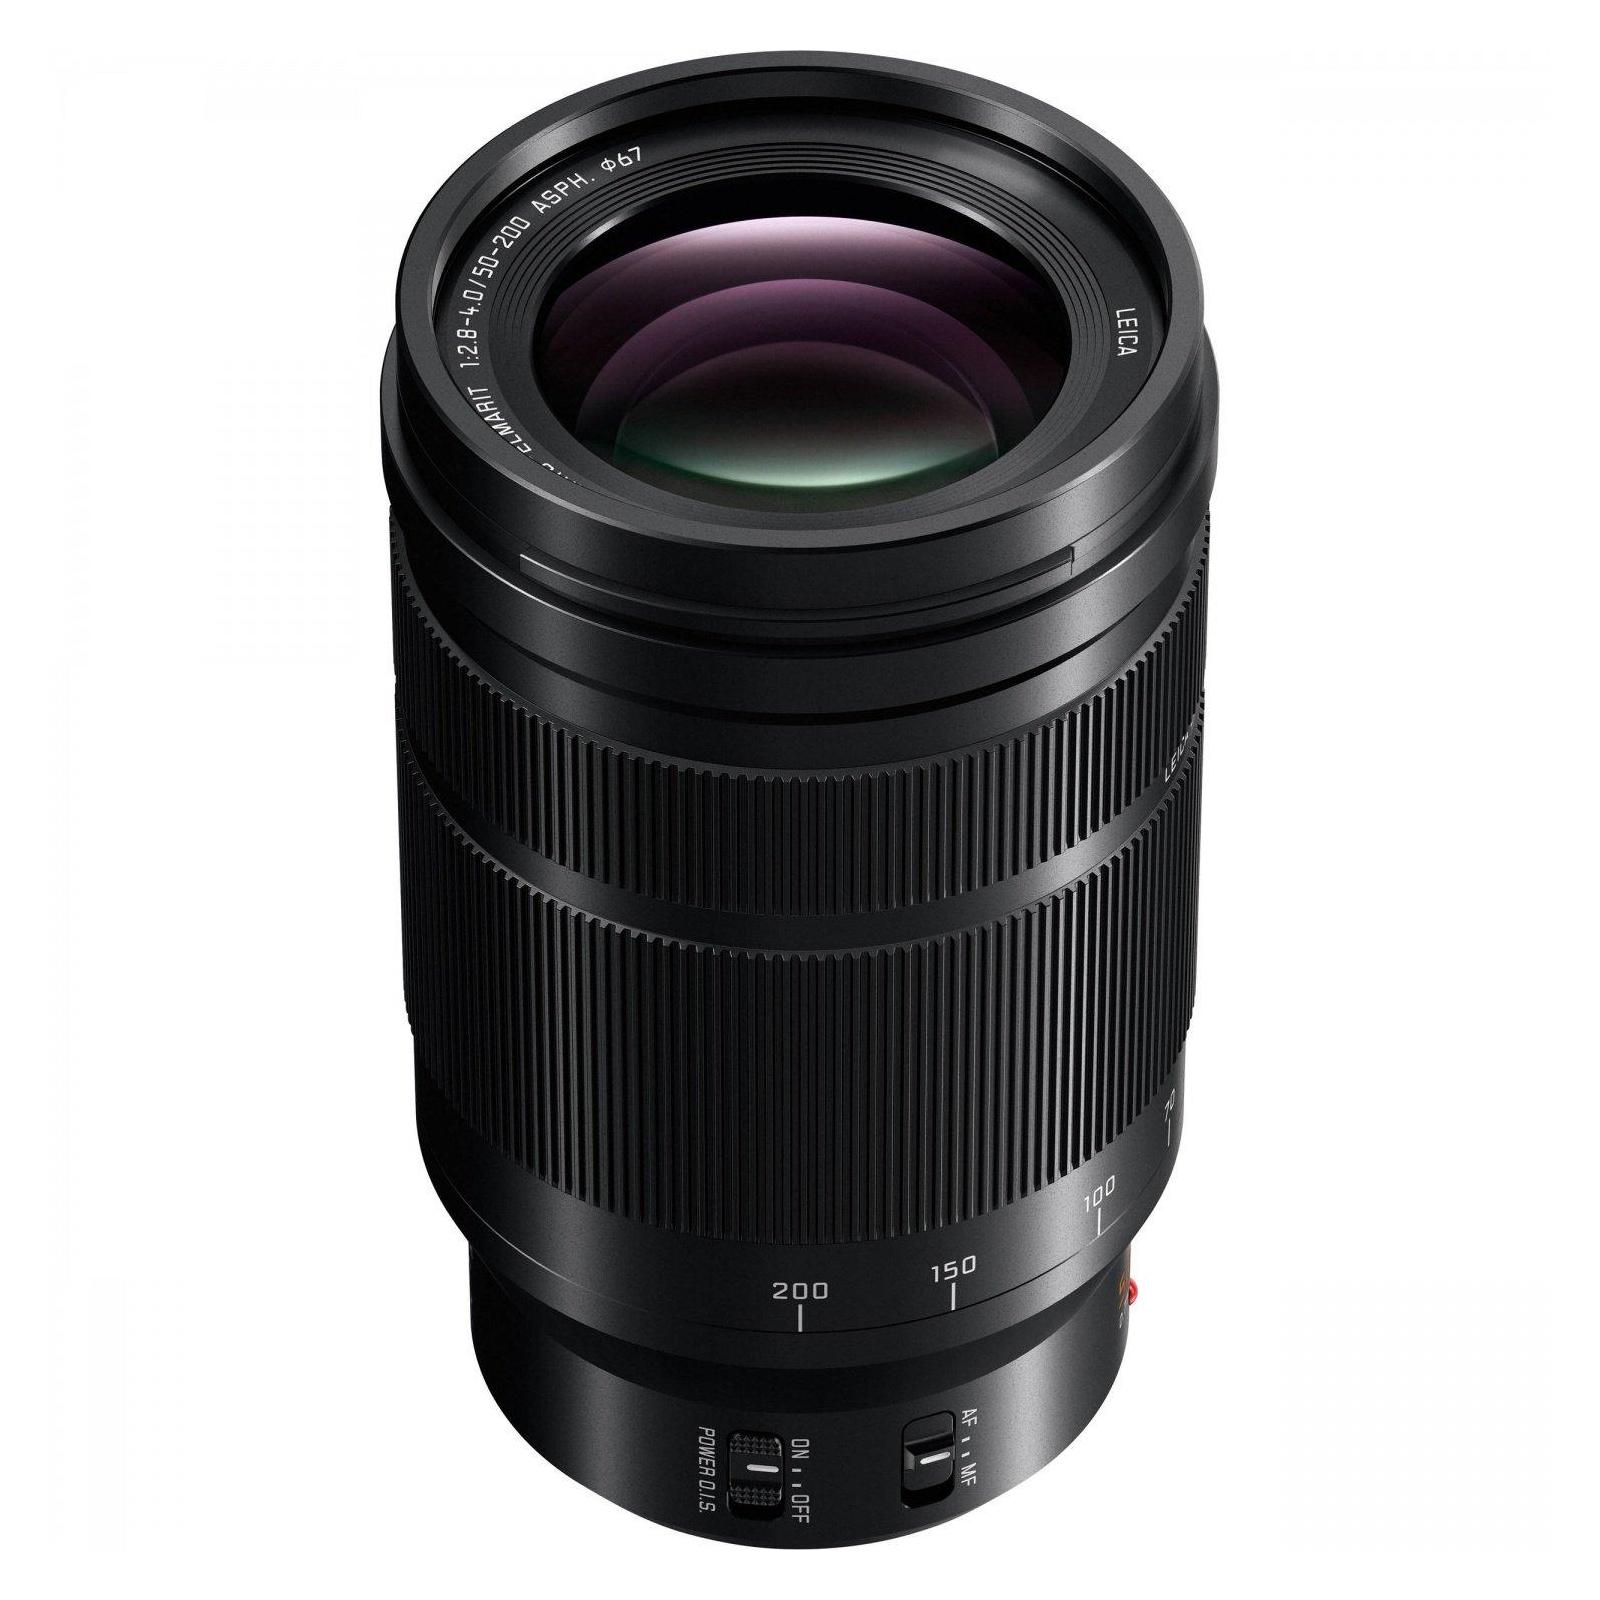 Объектив PANASONIC Micro 4/3 Lens 50-200 mm f/2.8-4 ASPH. POWER O.I.S. Leica DG (H-ES50200E) изображение 2